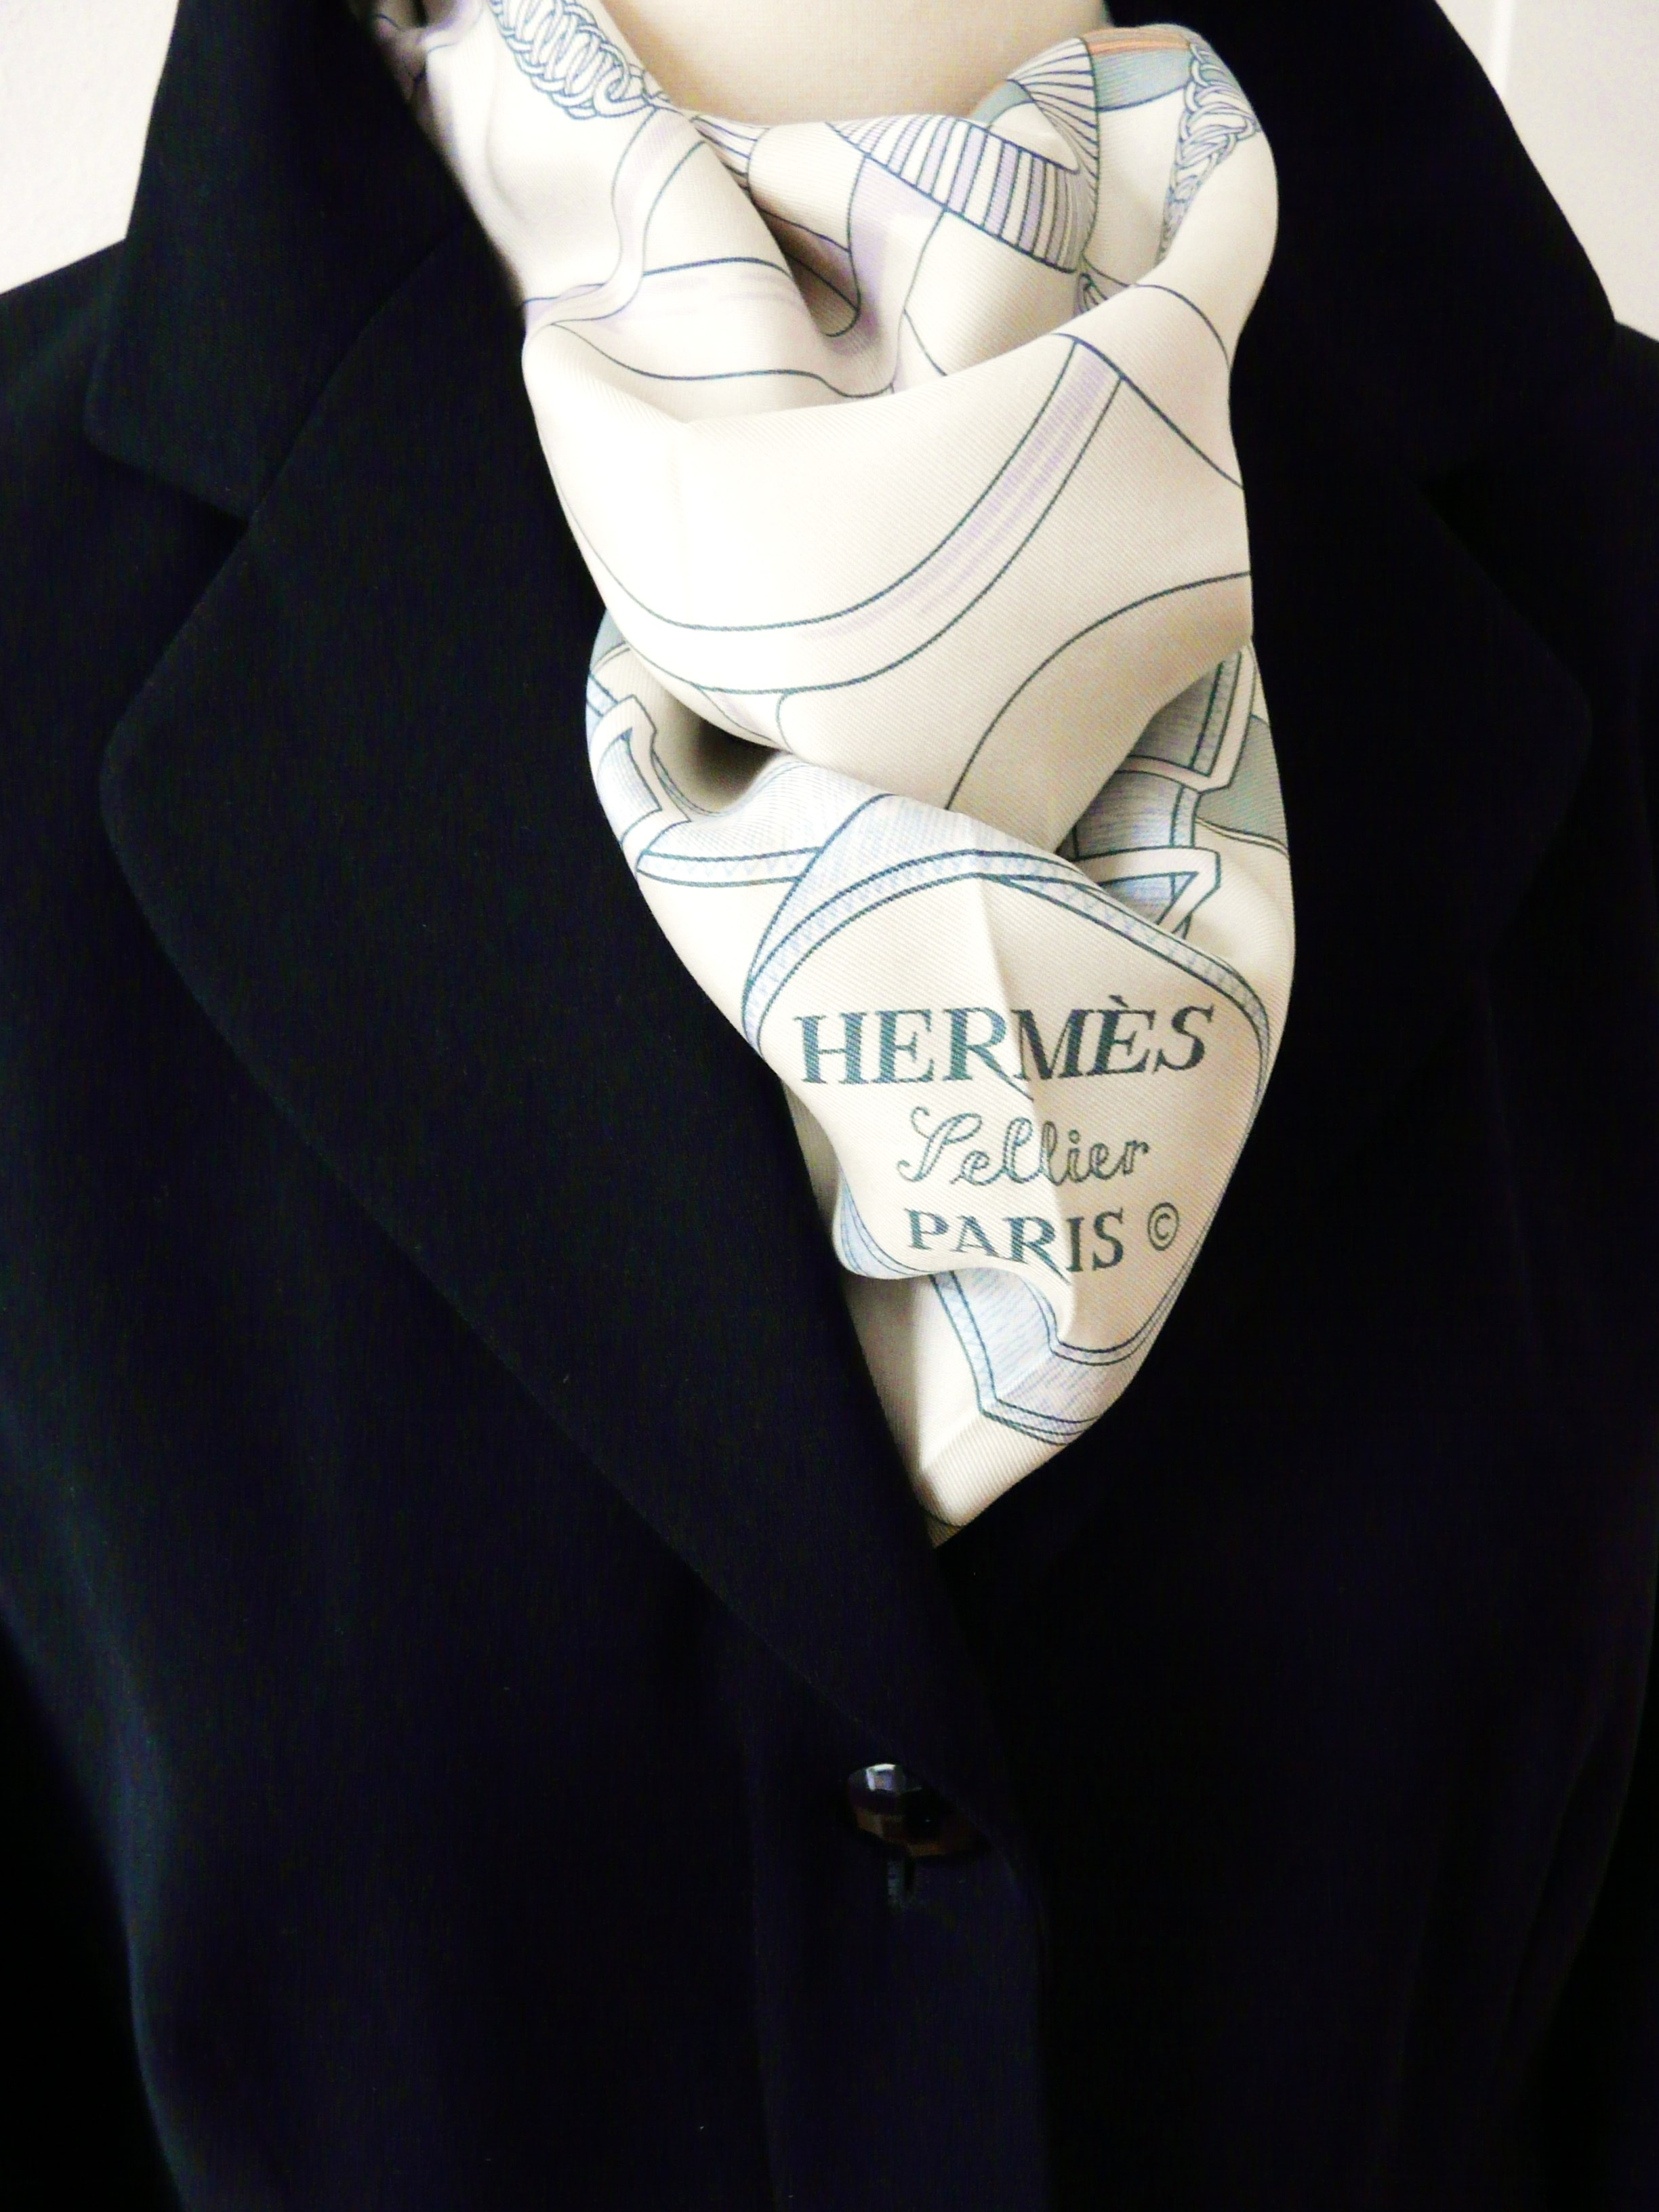 c90f6594c81e How to care for your Hermes carre – Carre de Paris HERMES© Scarf Blog